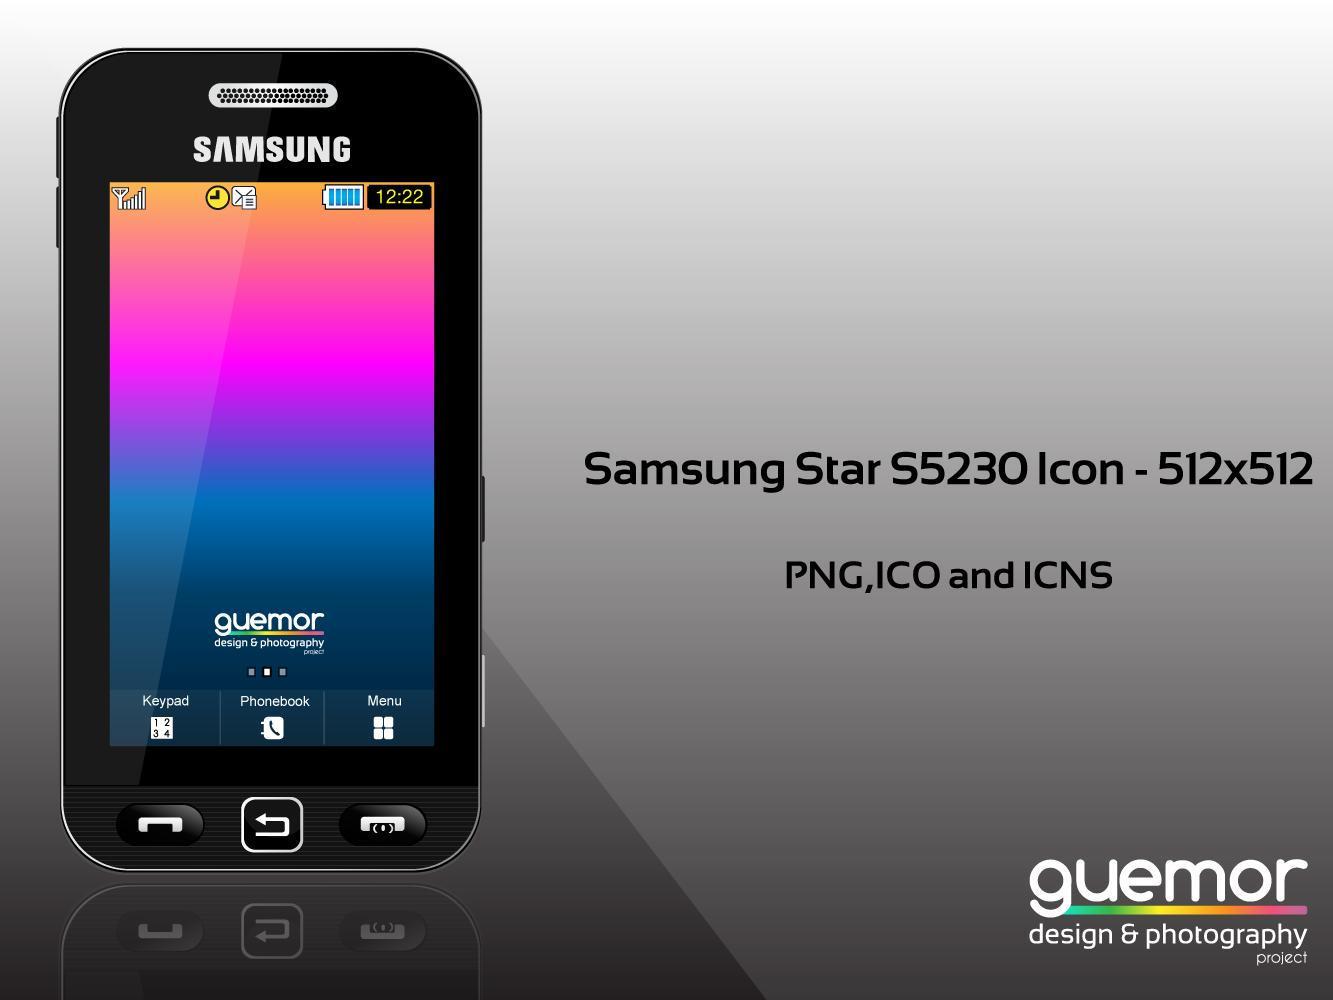 samsung star s5230 icon by guemor on deviantart. Black Bedroom Furniture Sets. Home Design Ideas